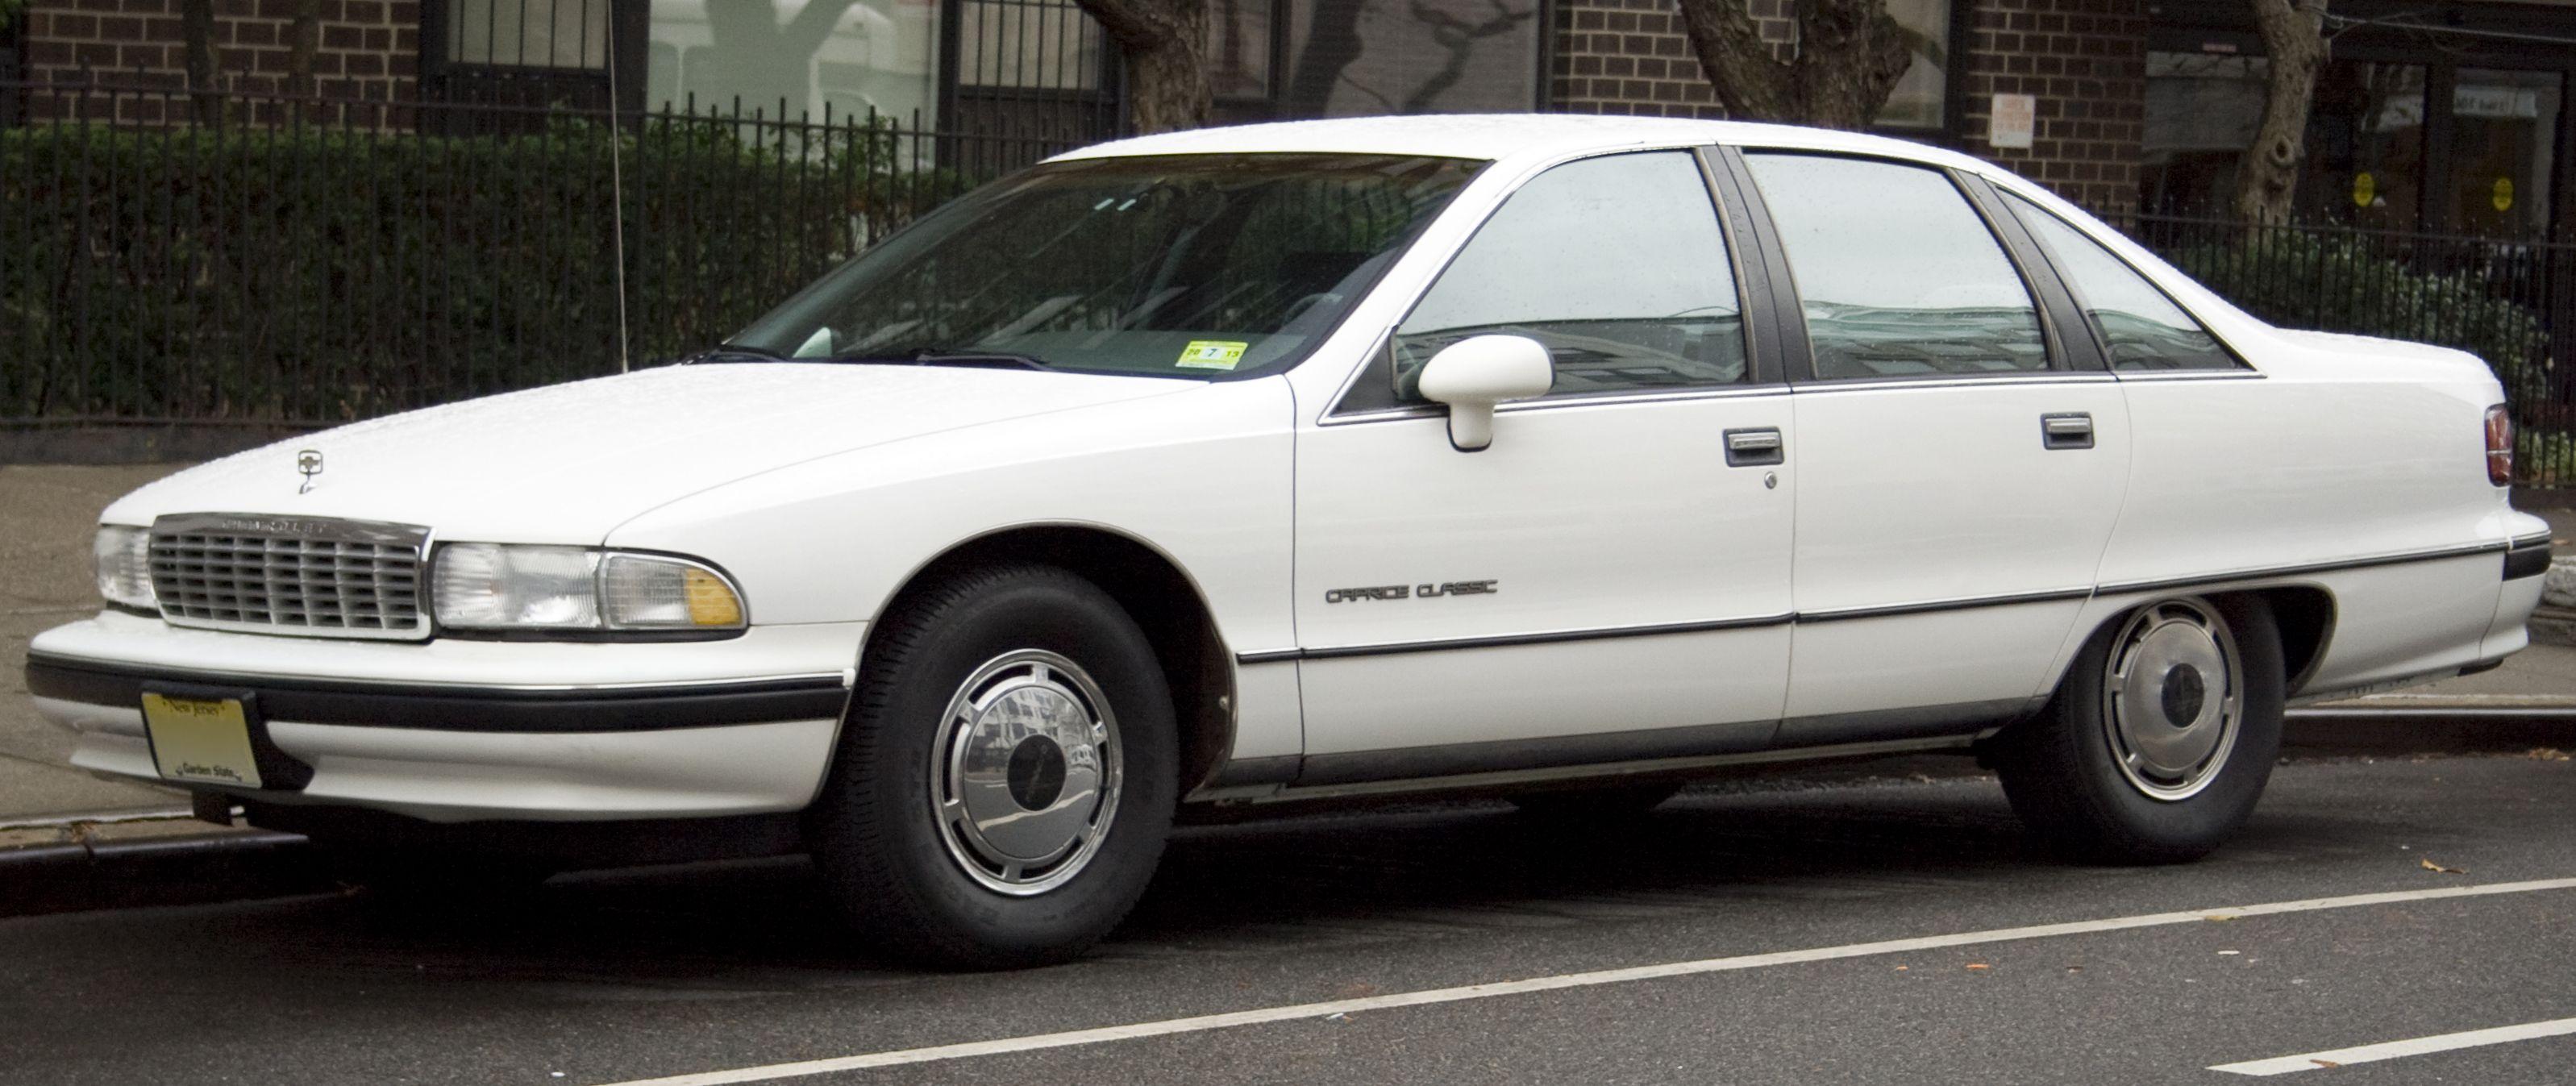 1991 Chevrolet Caprice 3 In 2020 Chevrolet Caprice Chevrolet Chevrolet Captiva